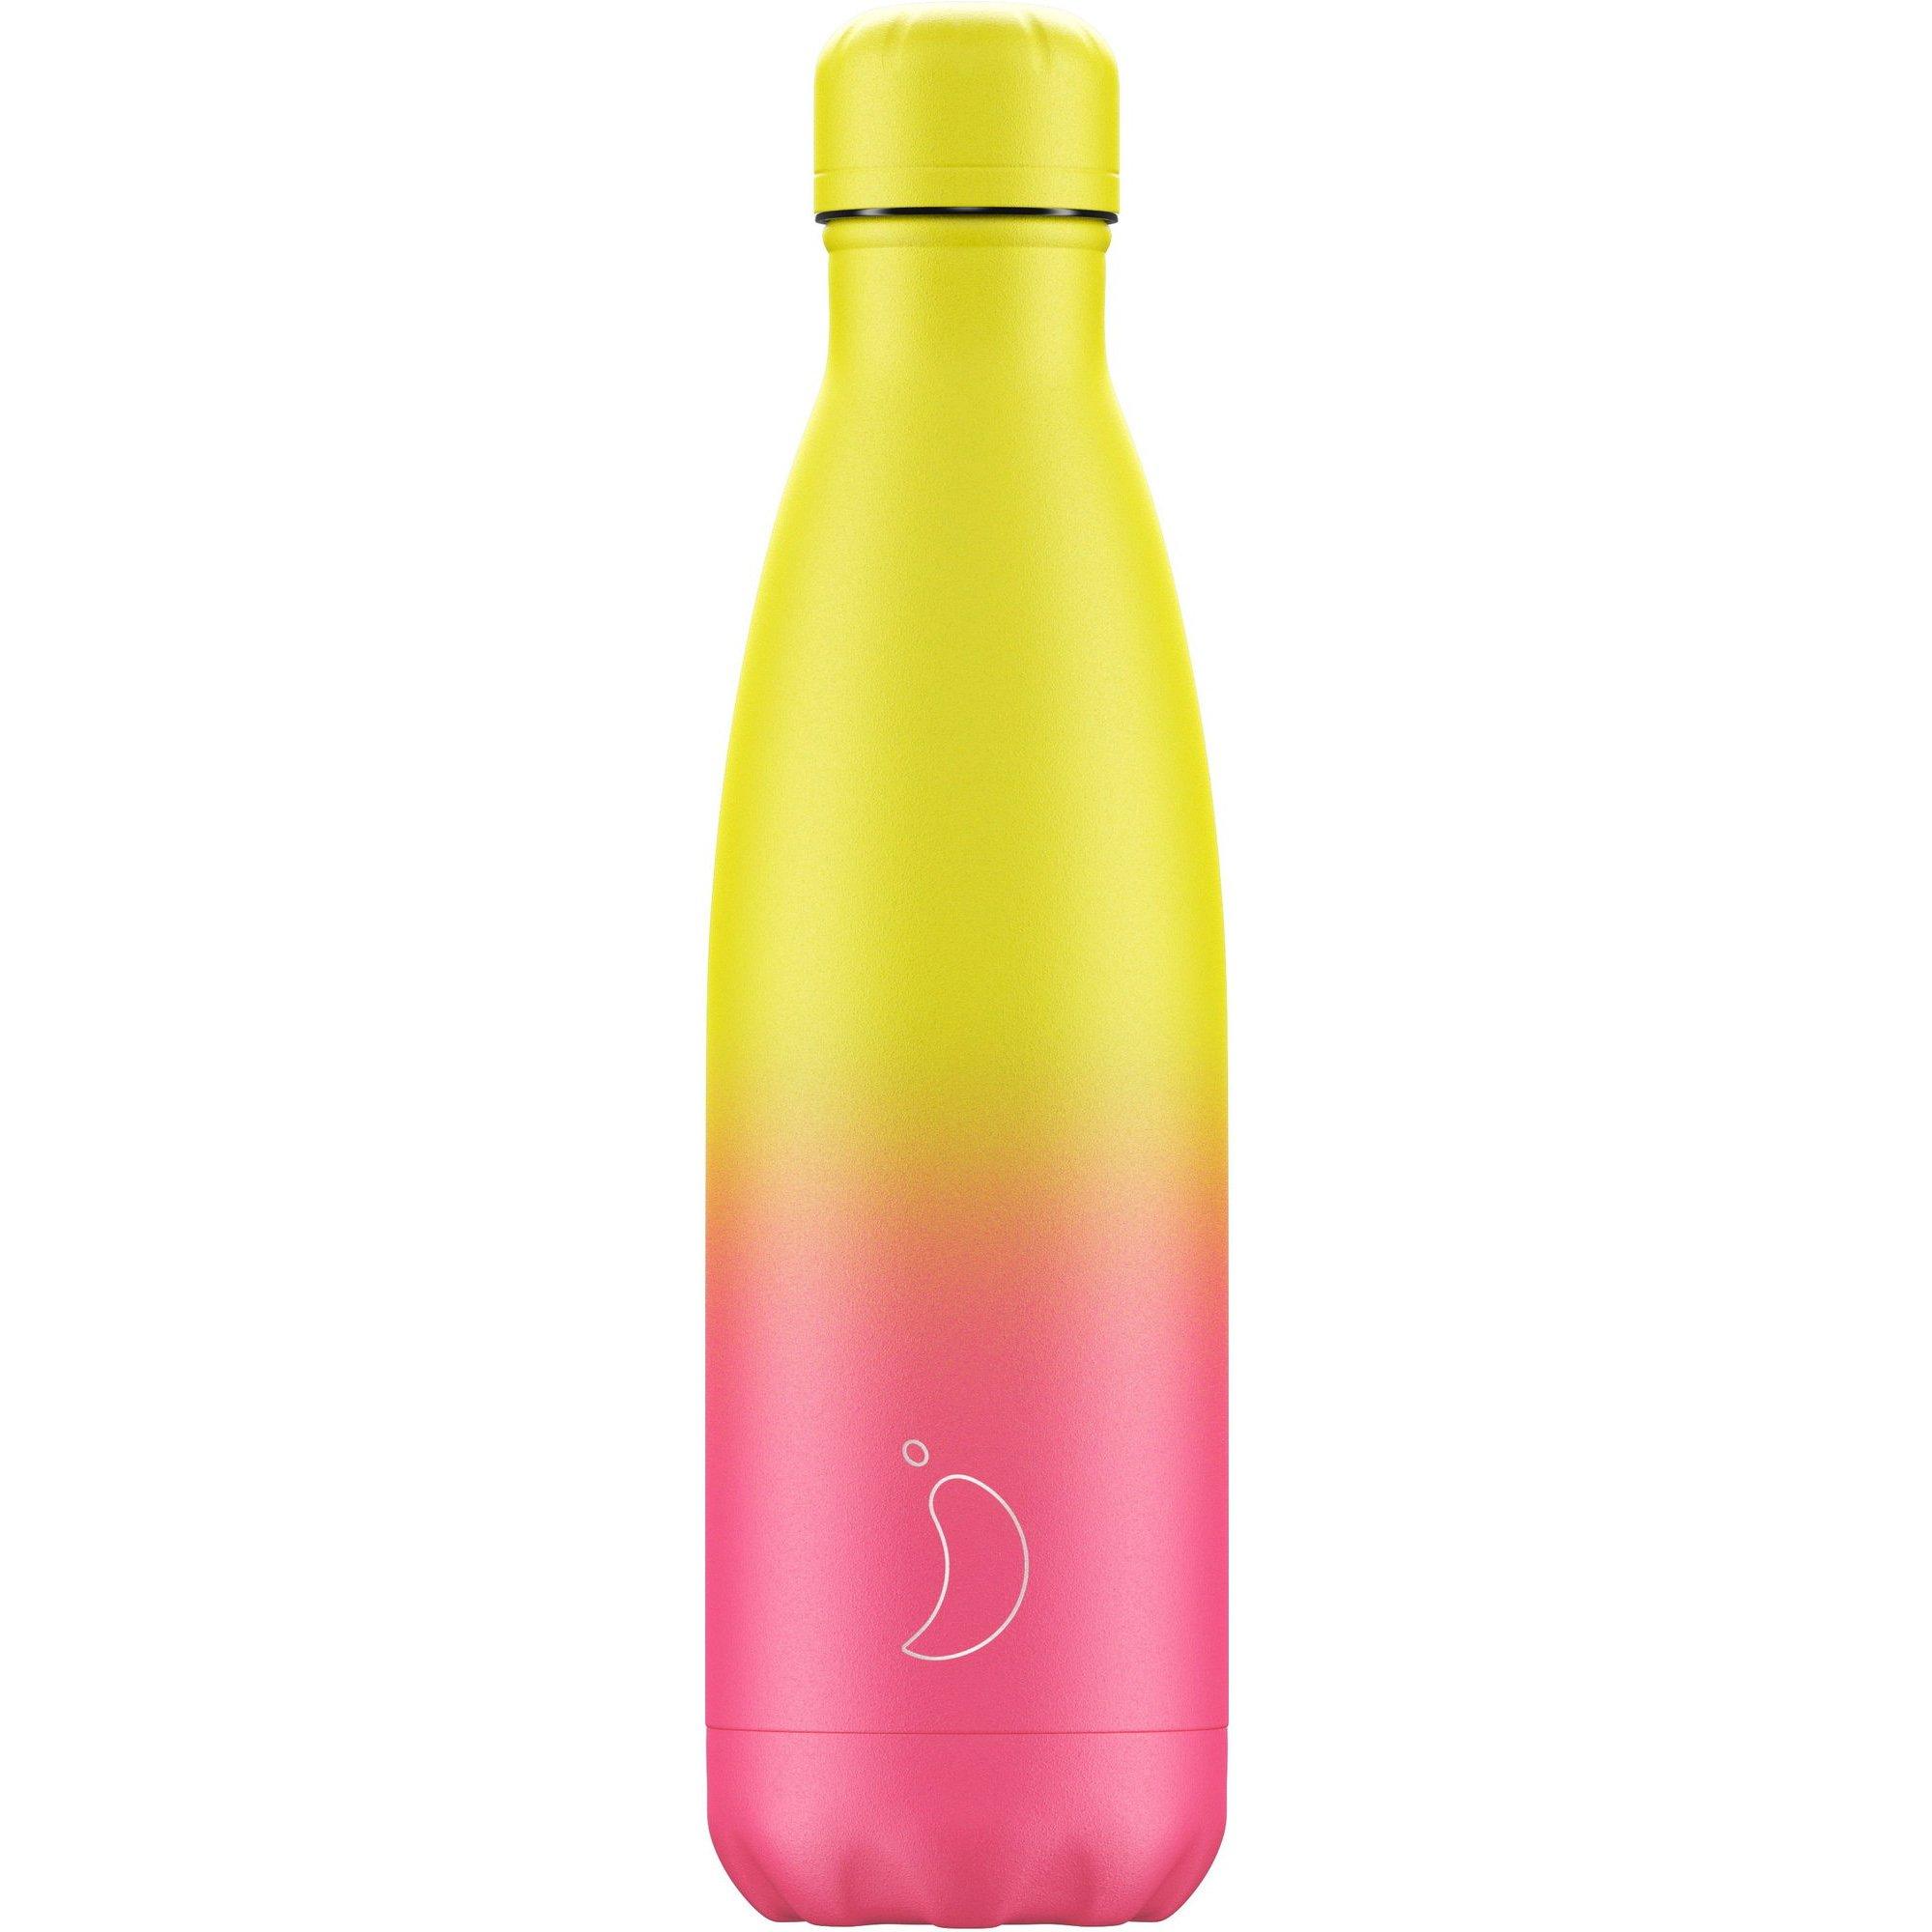 Chilly's Bottle Gradient Edition Neon Ανοξείδωτο Θερμός σε Ροζ με Κίτρινο Χρώμα 500ml